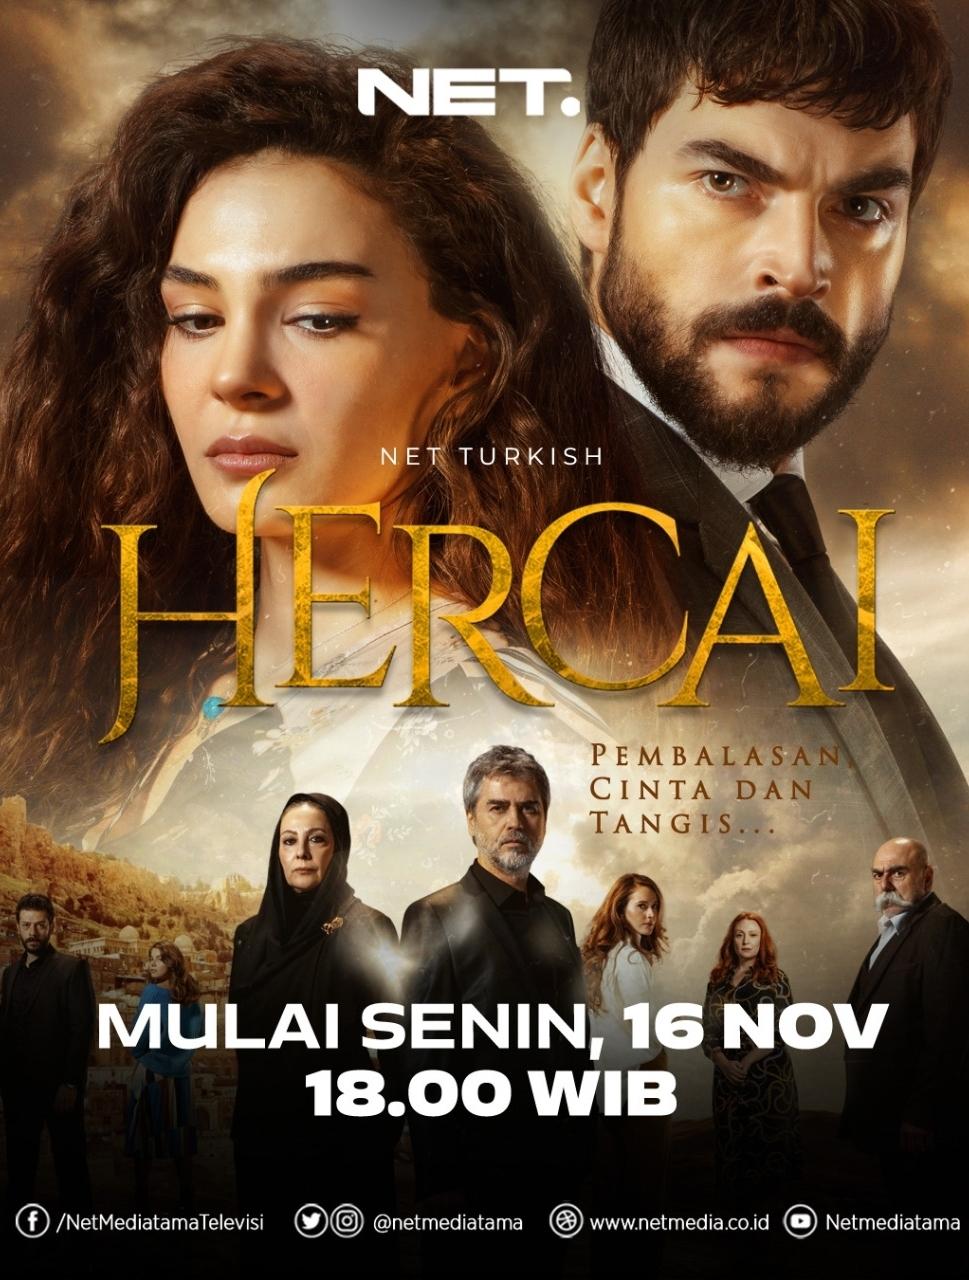 Hercai © 2020 brilio.net